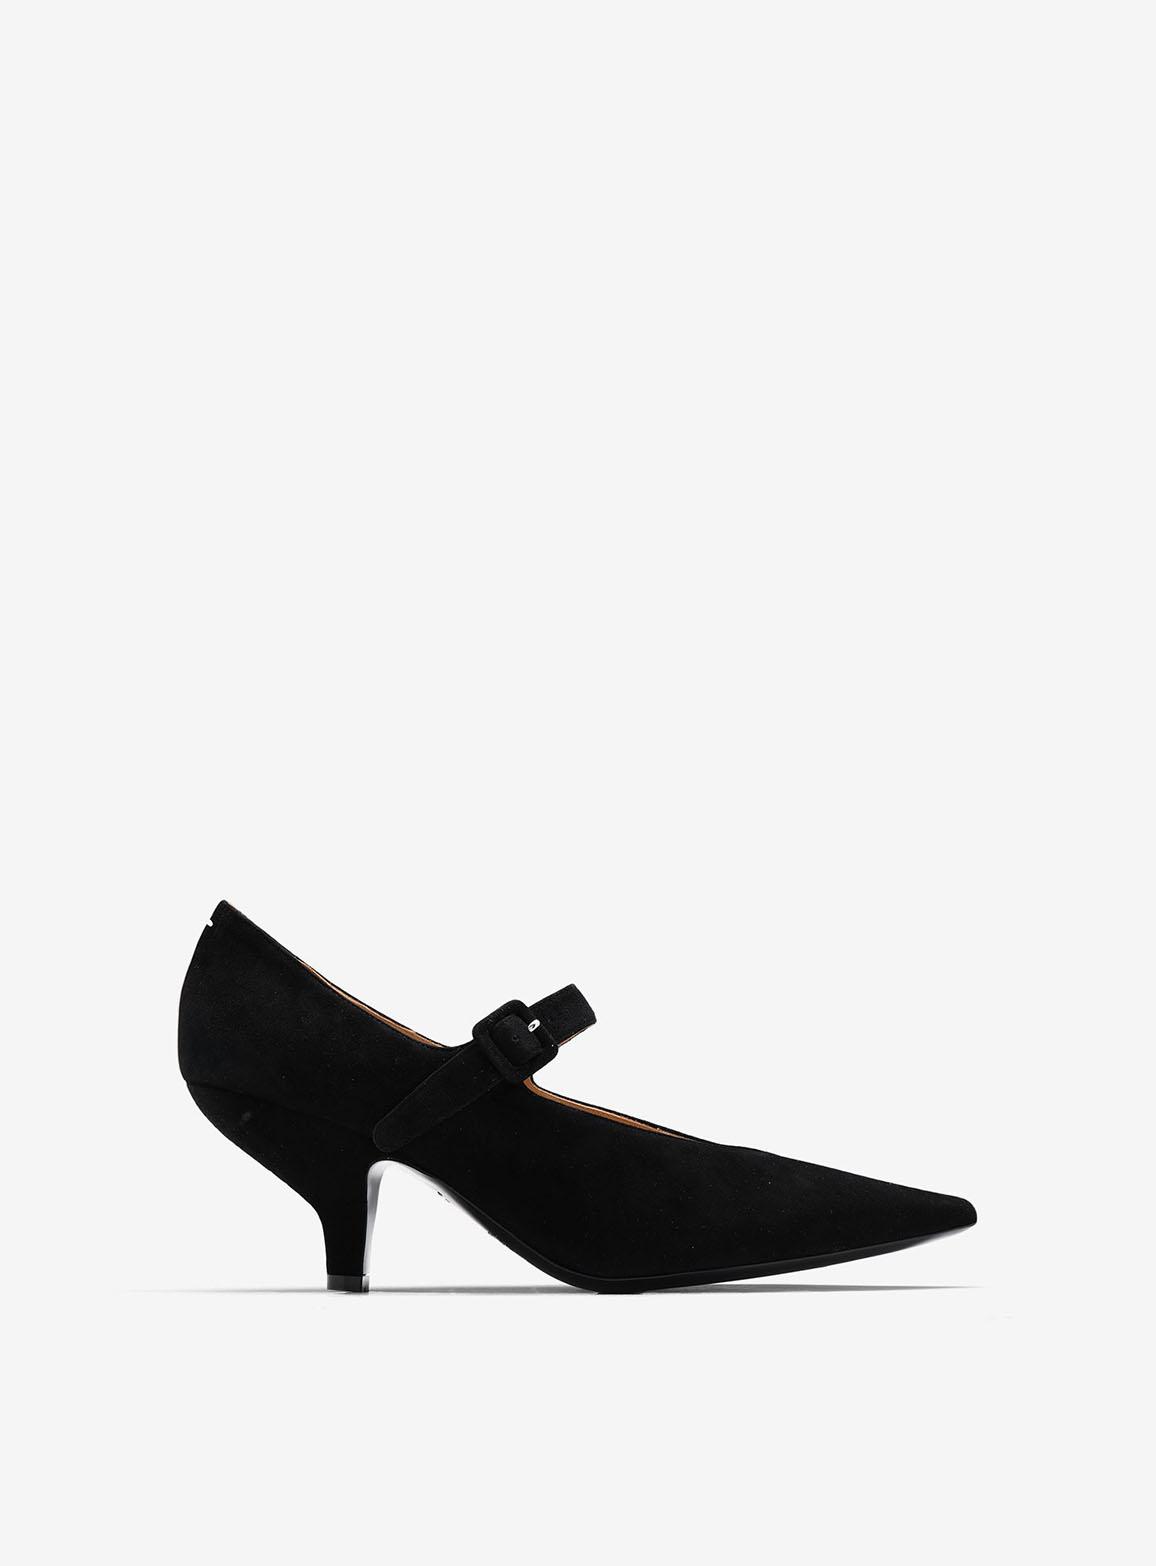 Tango Nina Mary-Jane shoes